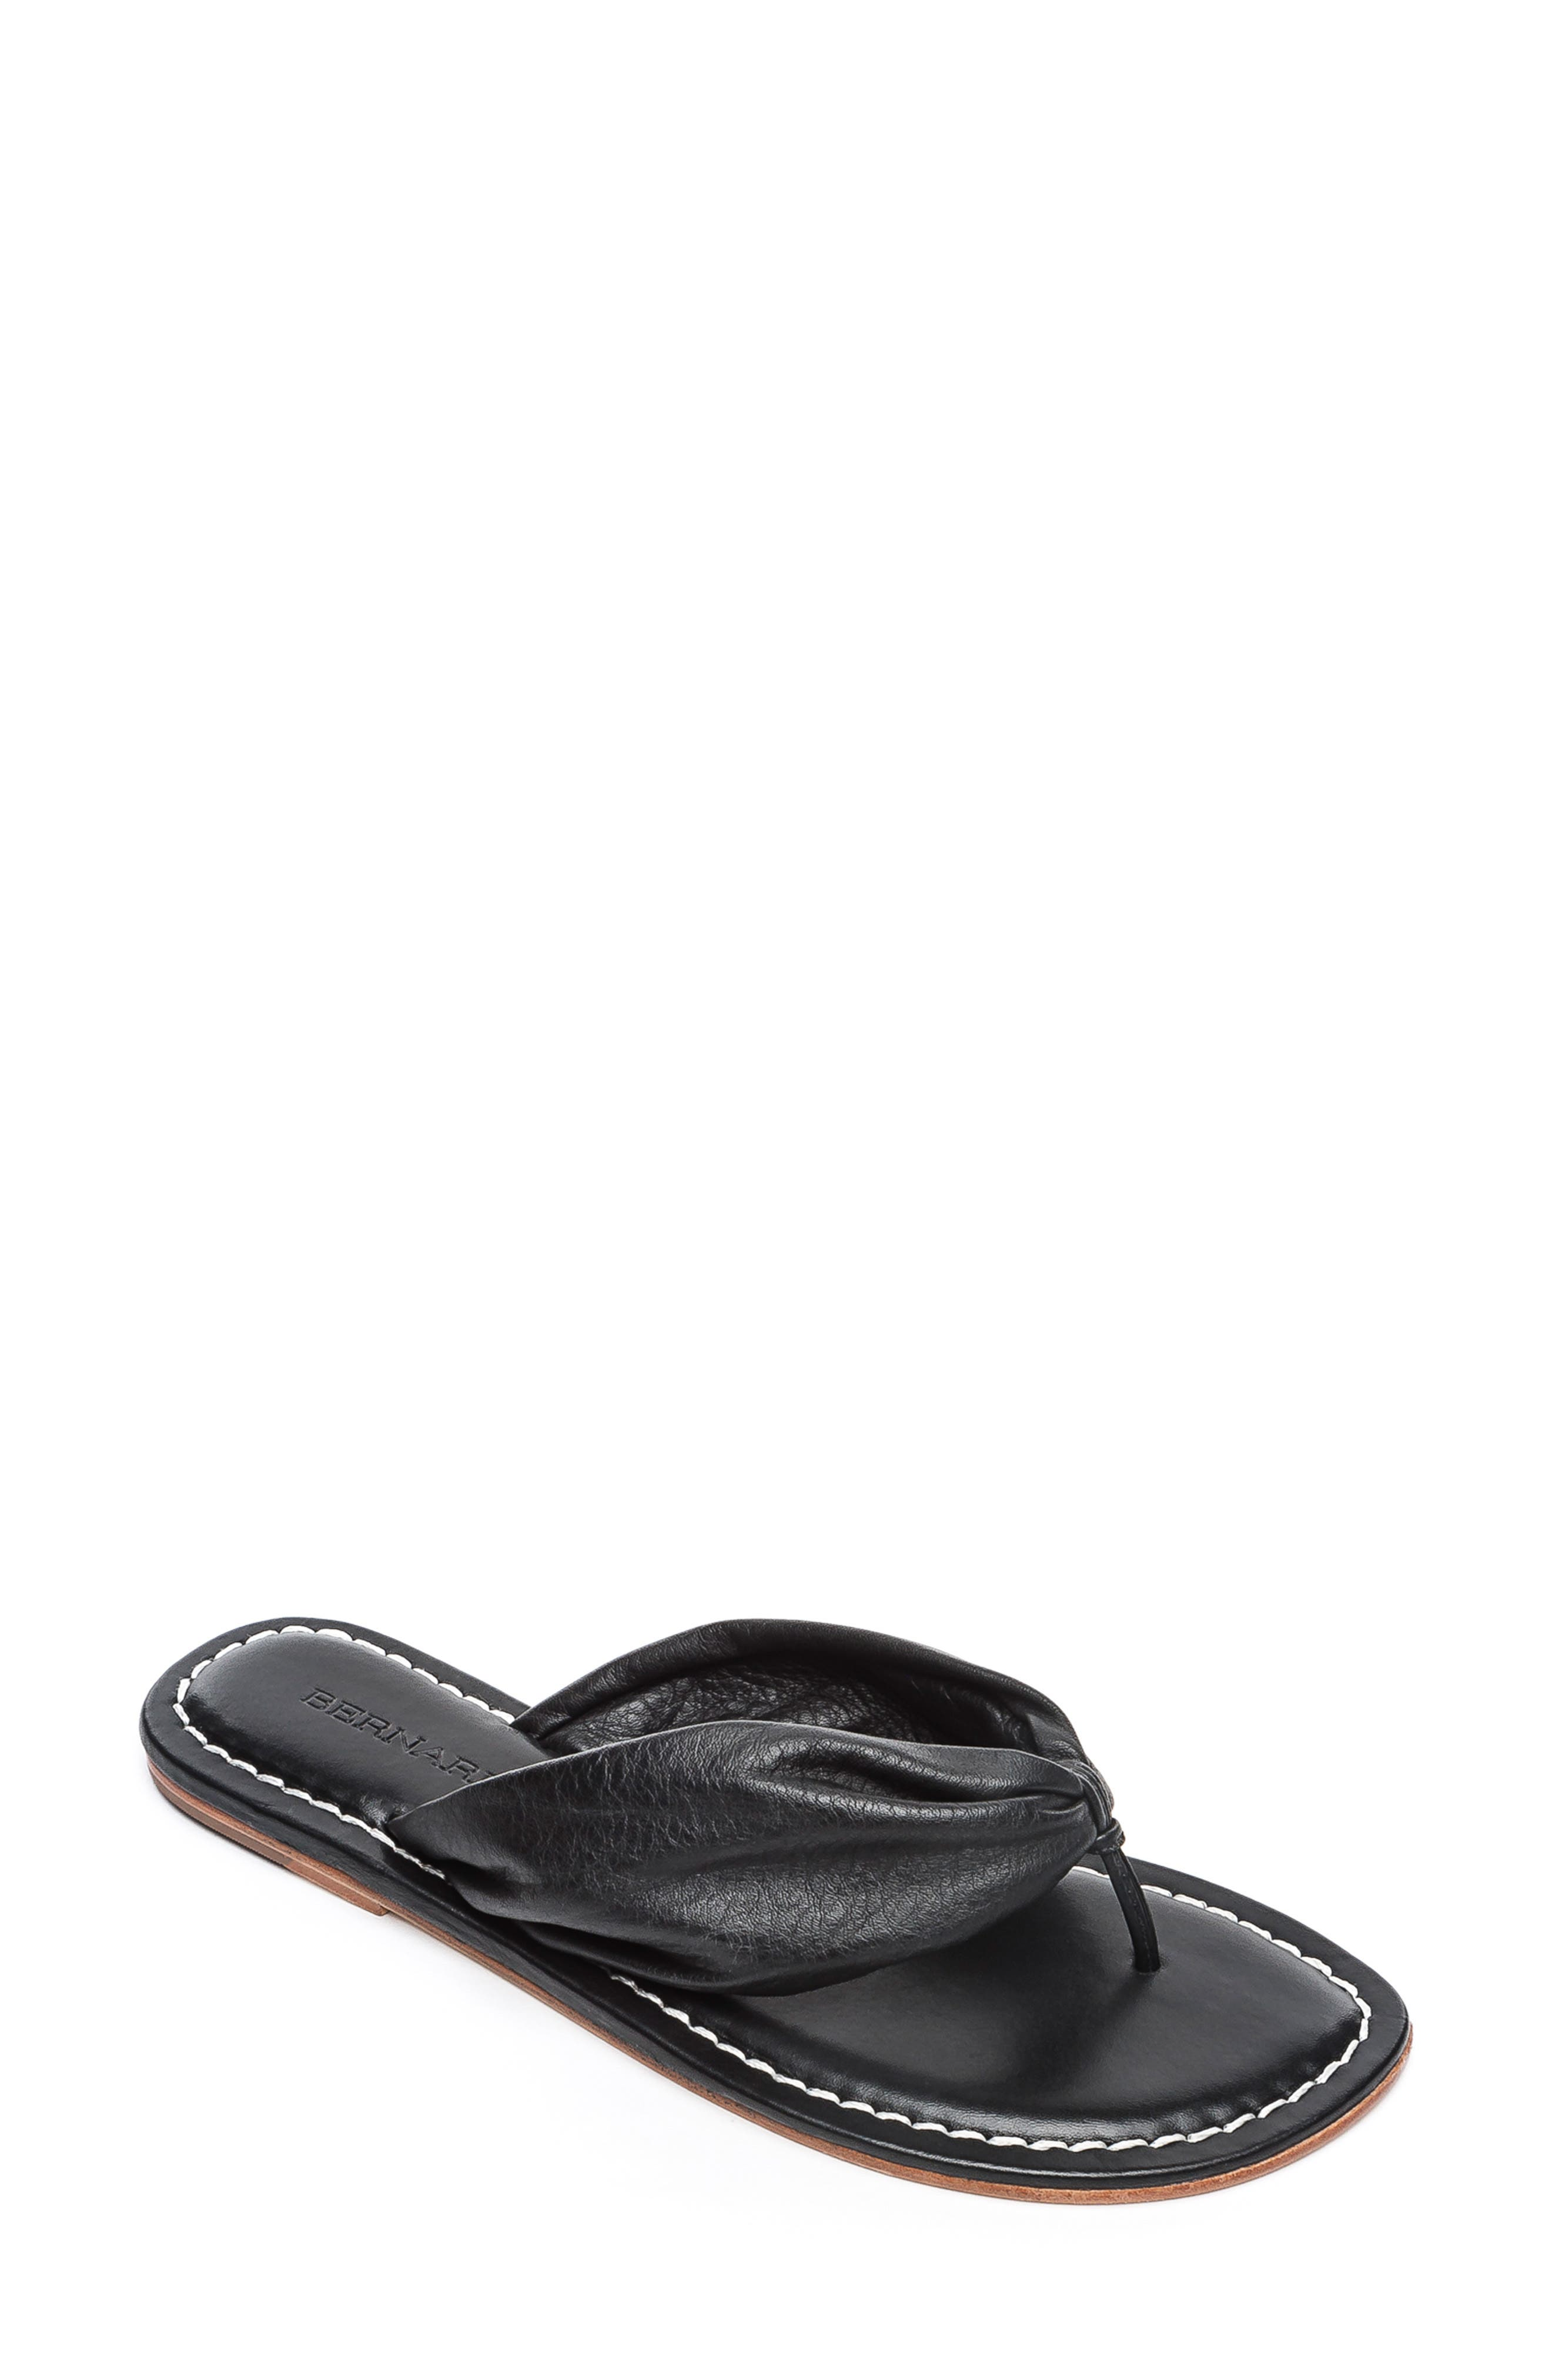 Bernardo Mila Flip Flop, Black